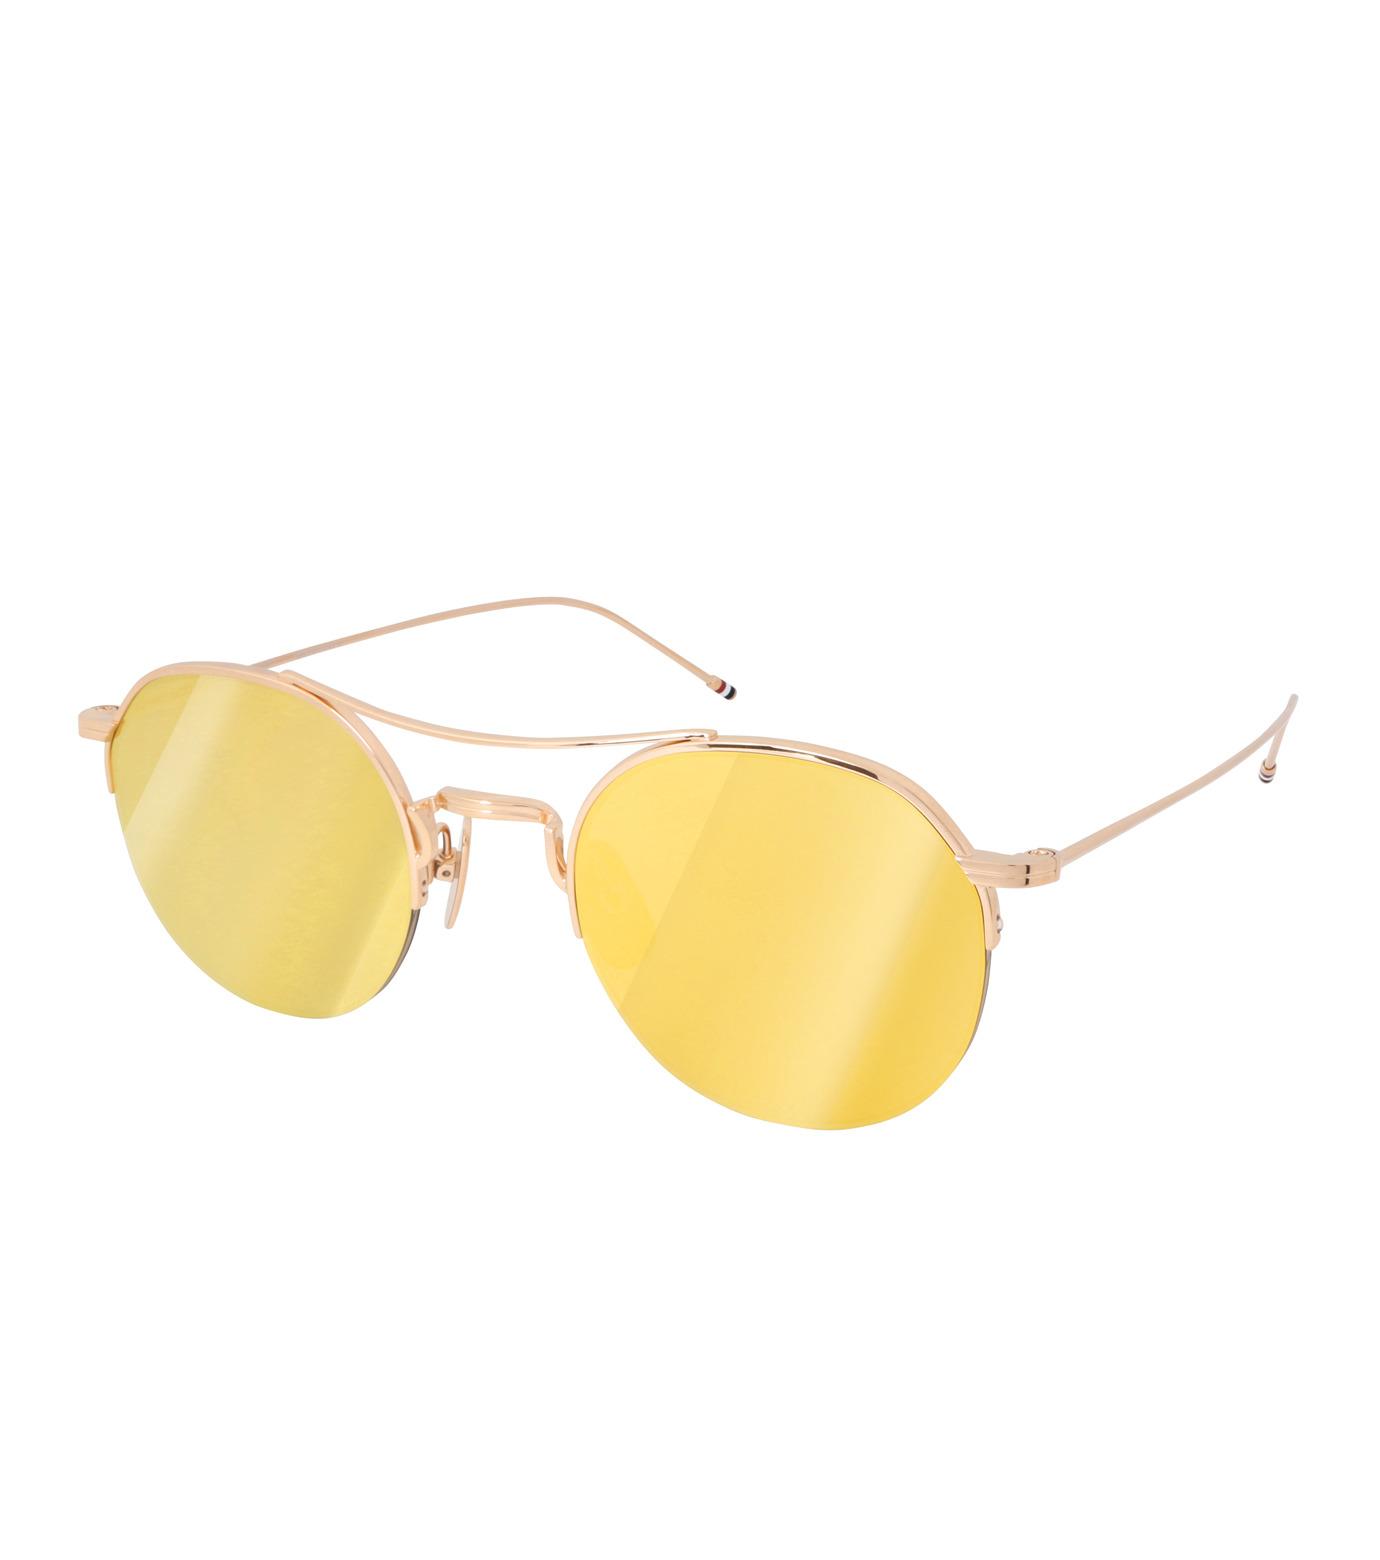 Thom Browne Eye Wear(トム・ブラウン・アイウェア)のTeardrop Gold Lens-GOLD(アイウェア/eyewear)-TB-903-A-T-2 拡大詳細画像1